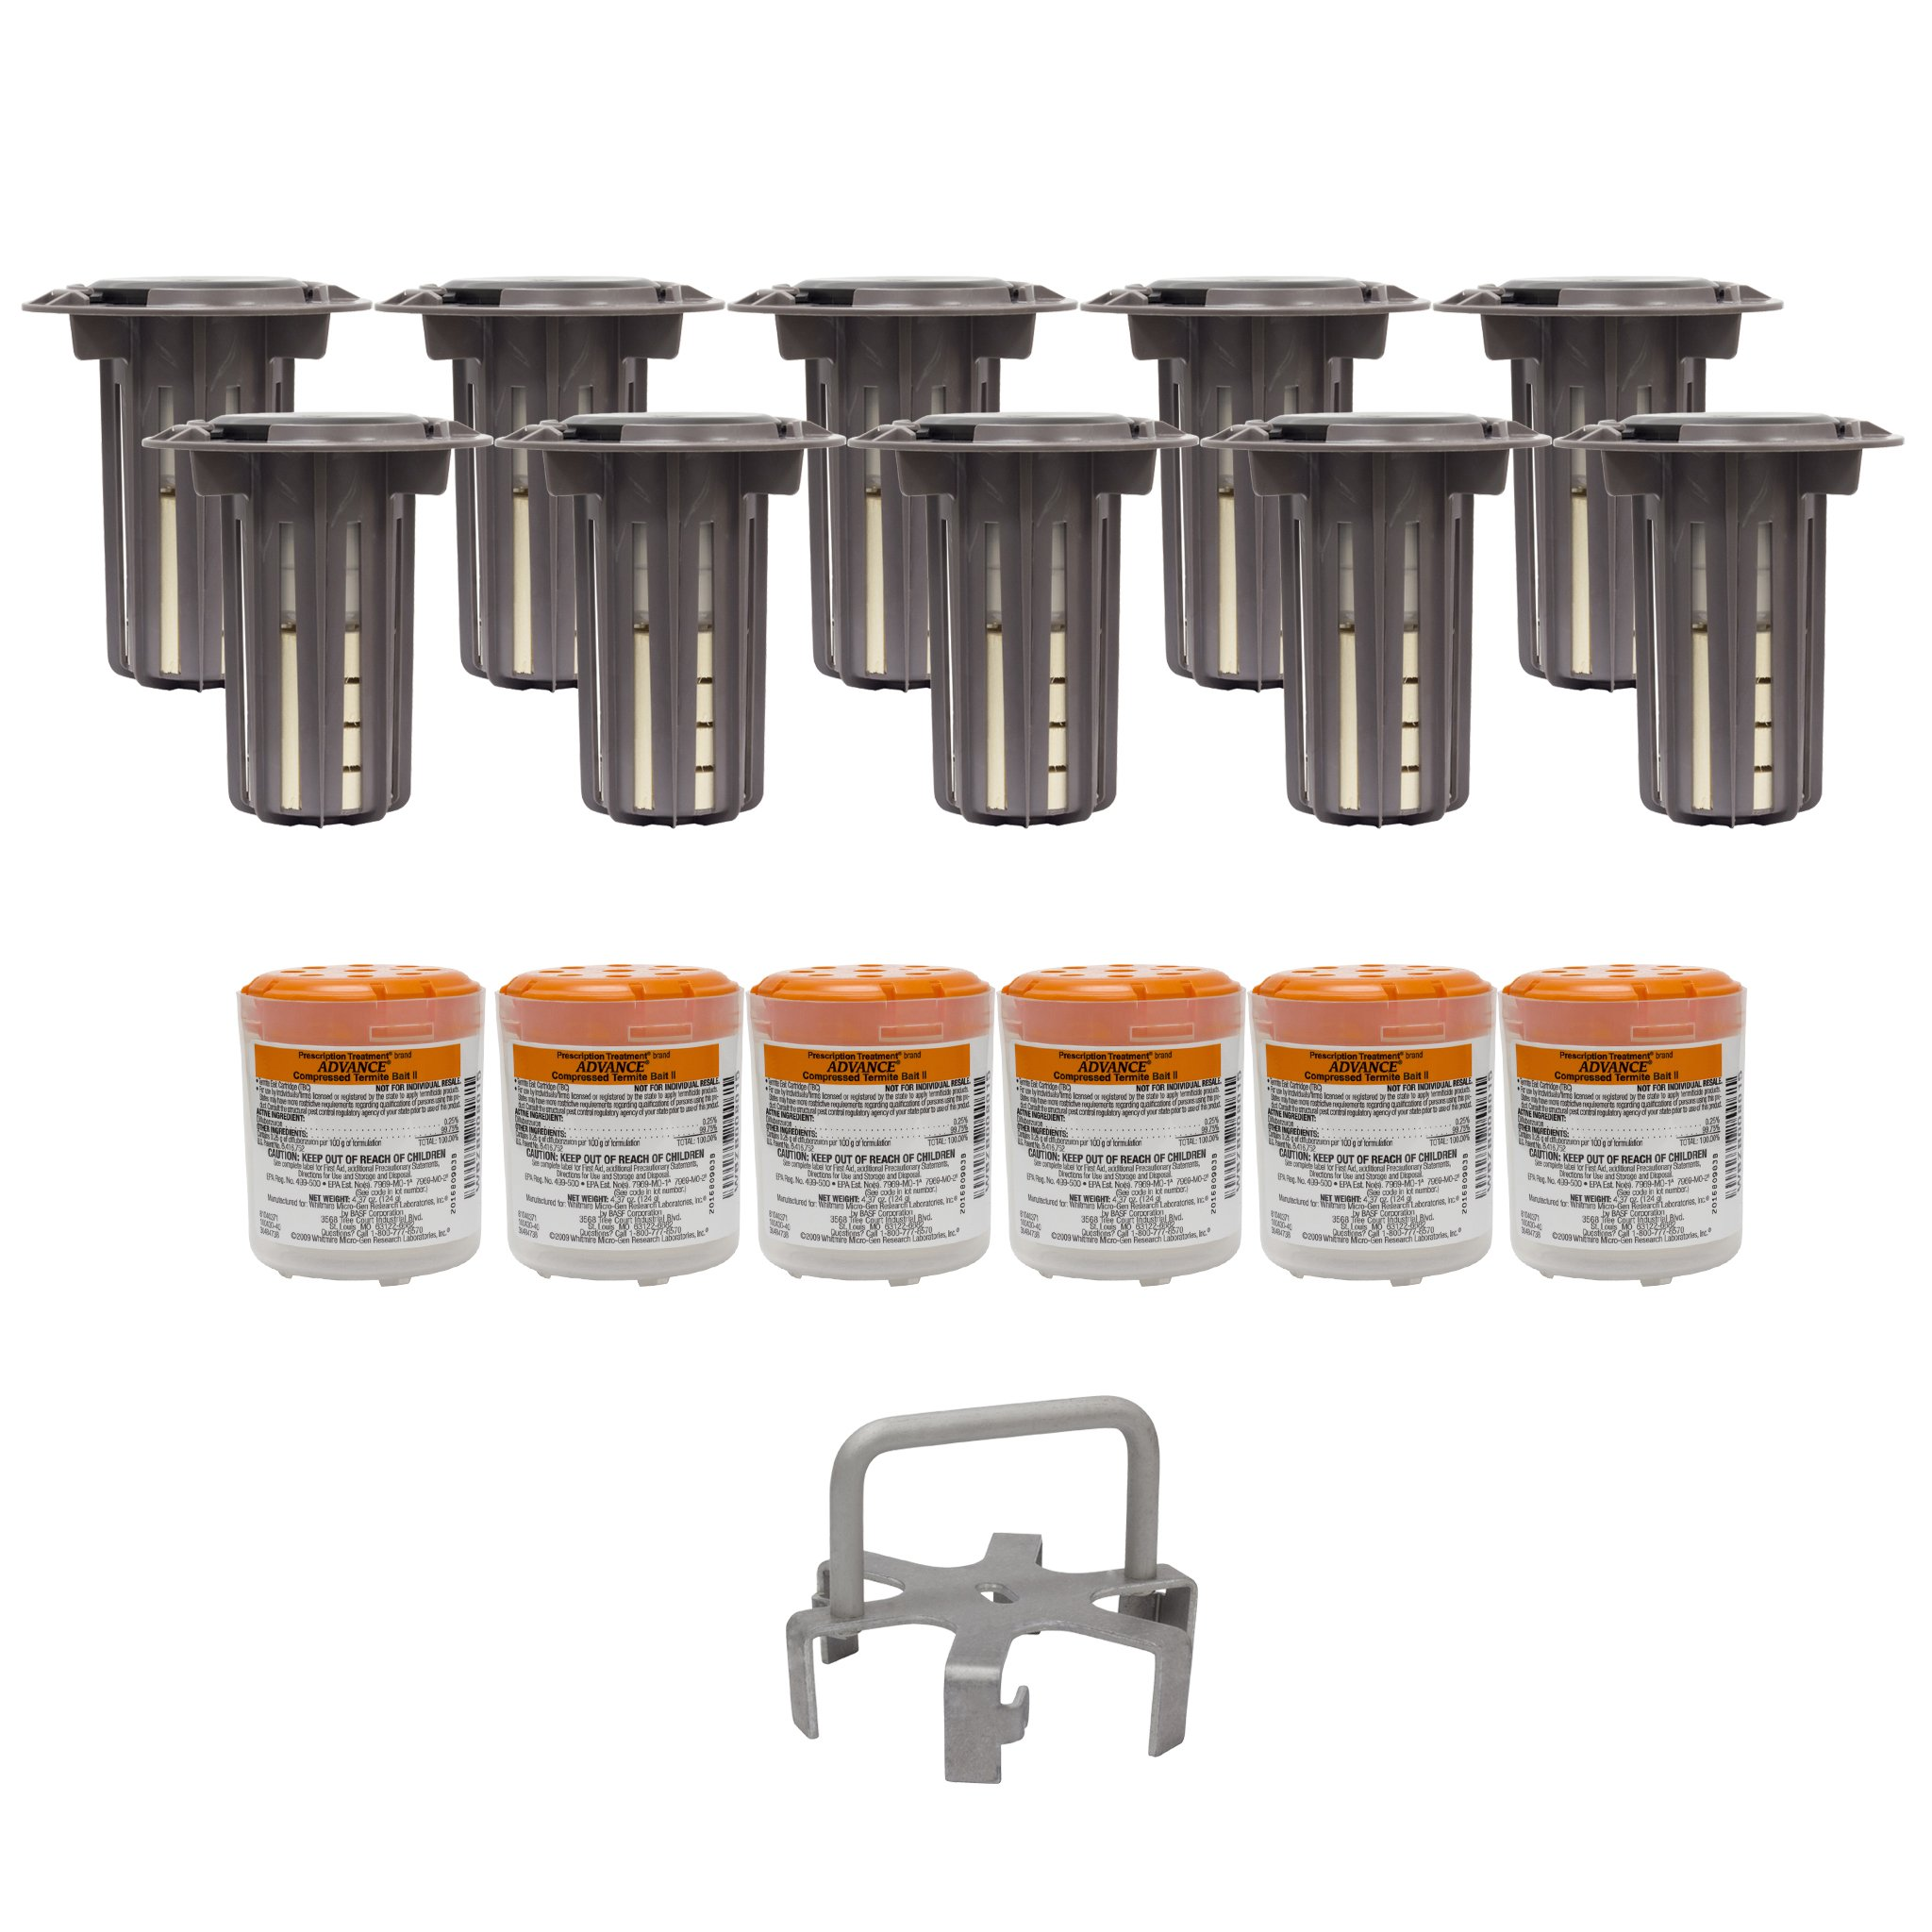 Advance Termite Bait Control Kit with Premise Foam KIT1030 by Whitmire Micro-Gen